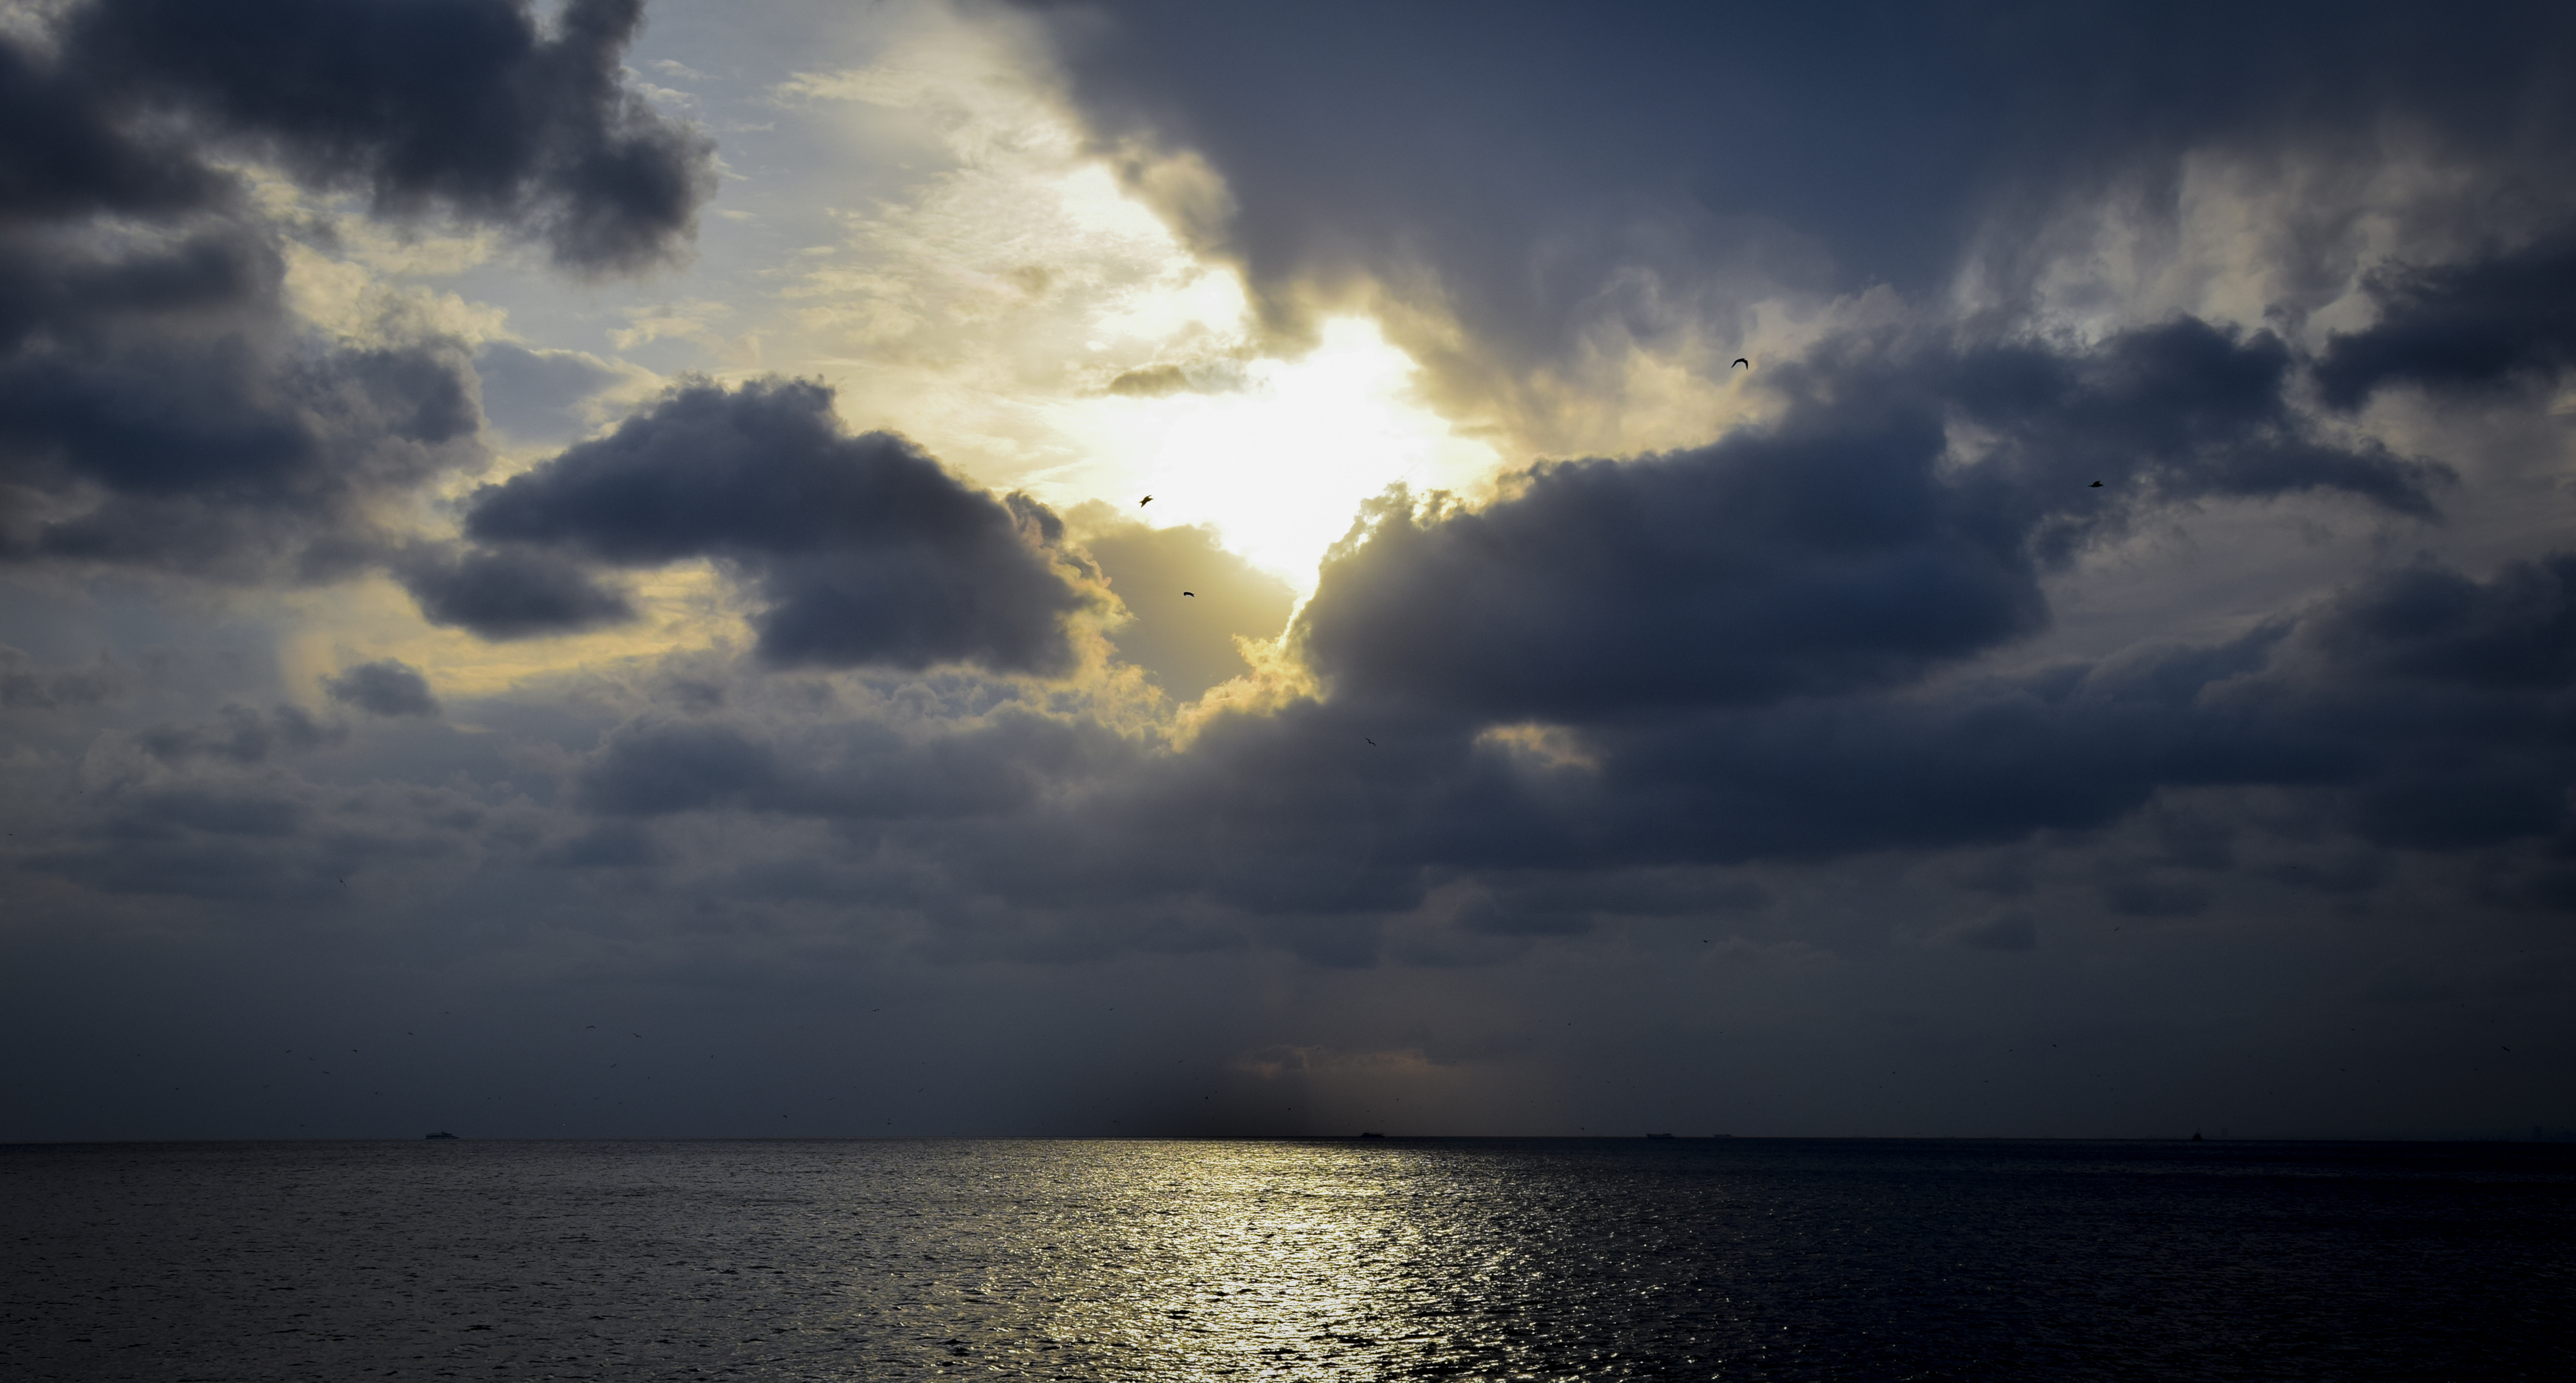 Blacksea and Sunset, Beach, Blacksea, Boat, Ocean, HQ Photo